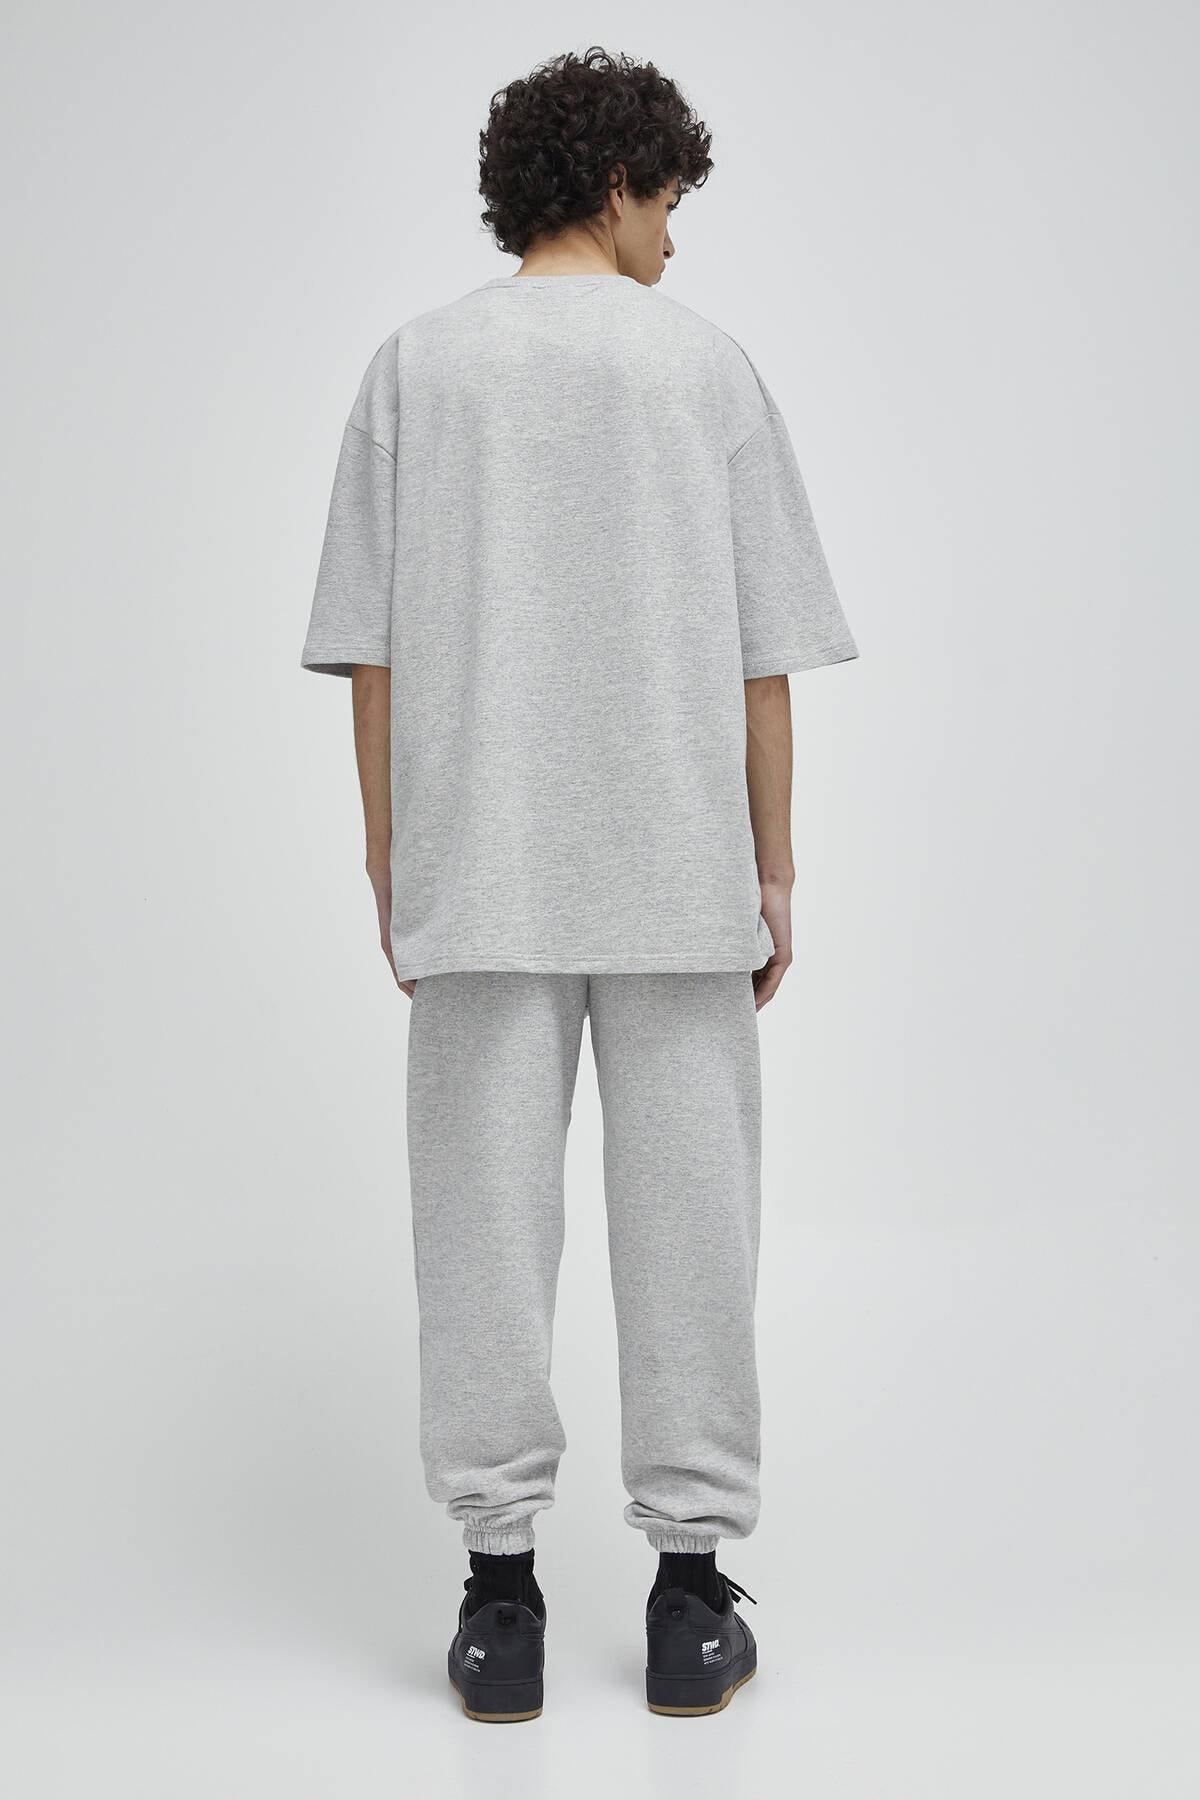 Pull & Bear Erkek Açık Gri Homewear Kapsül Koleksiyonu T-Shirt 04240542 2